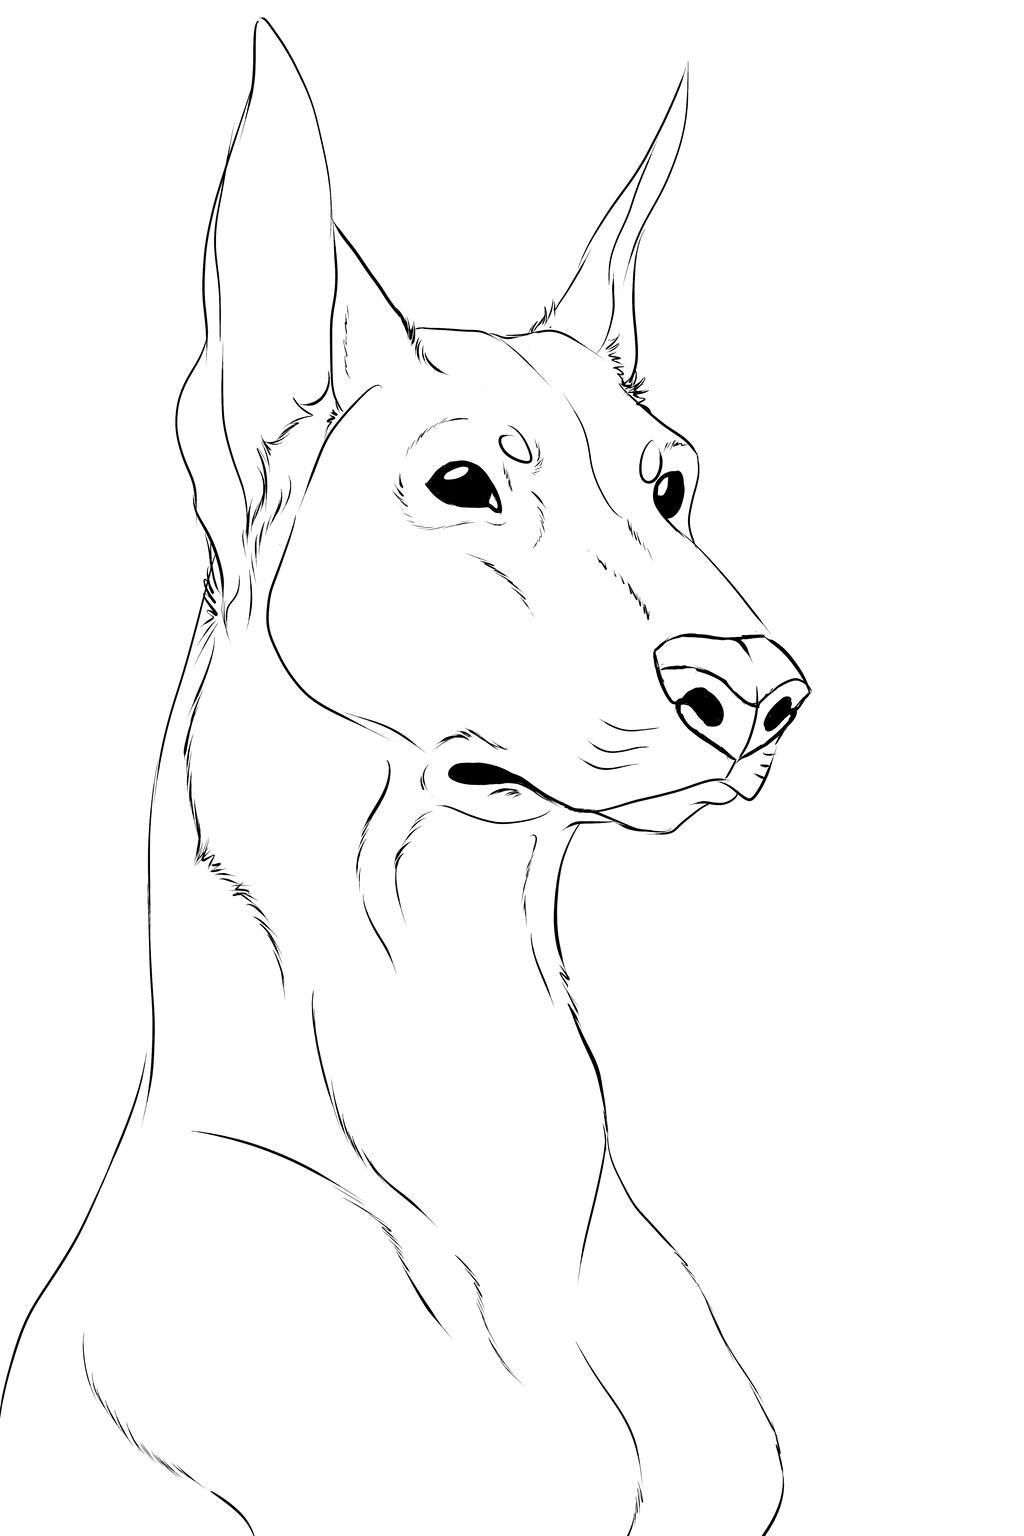 Woman Face Line Drawing Png : Doberman lineart transparent bg by socialbutter on deviantart